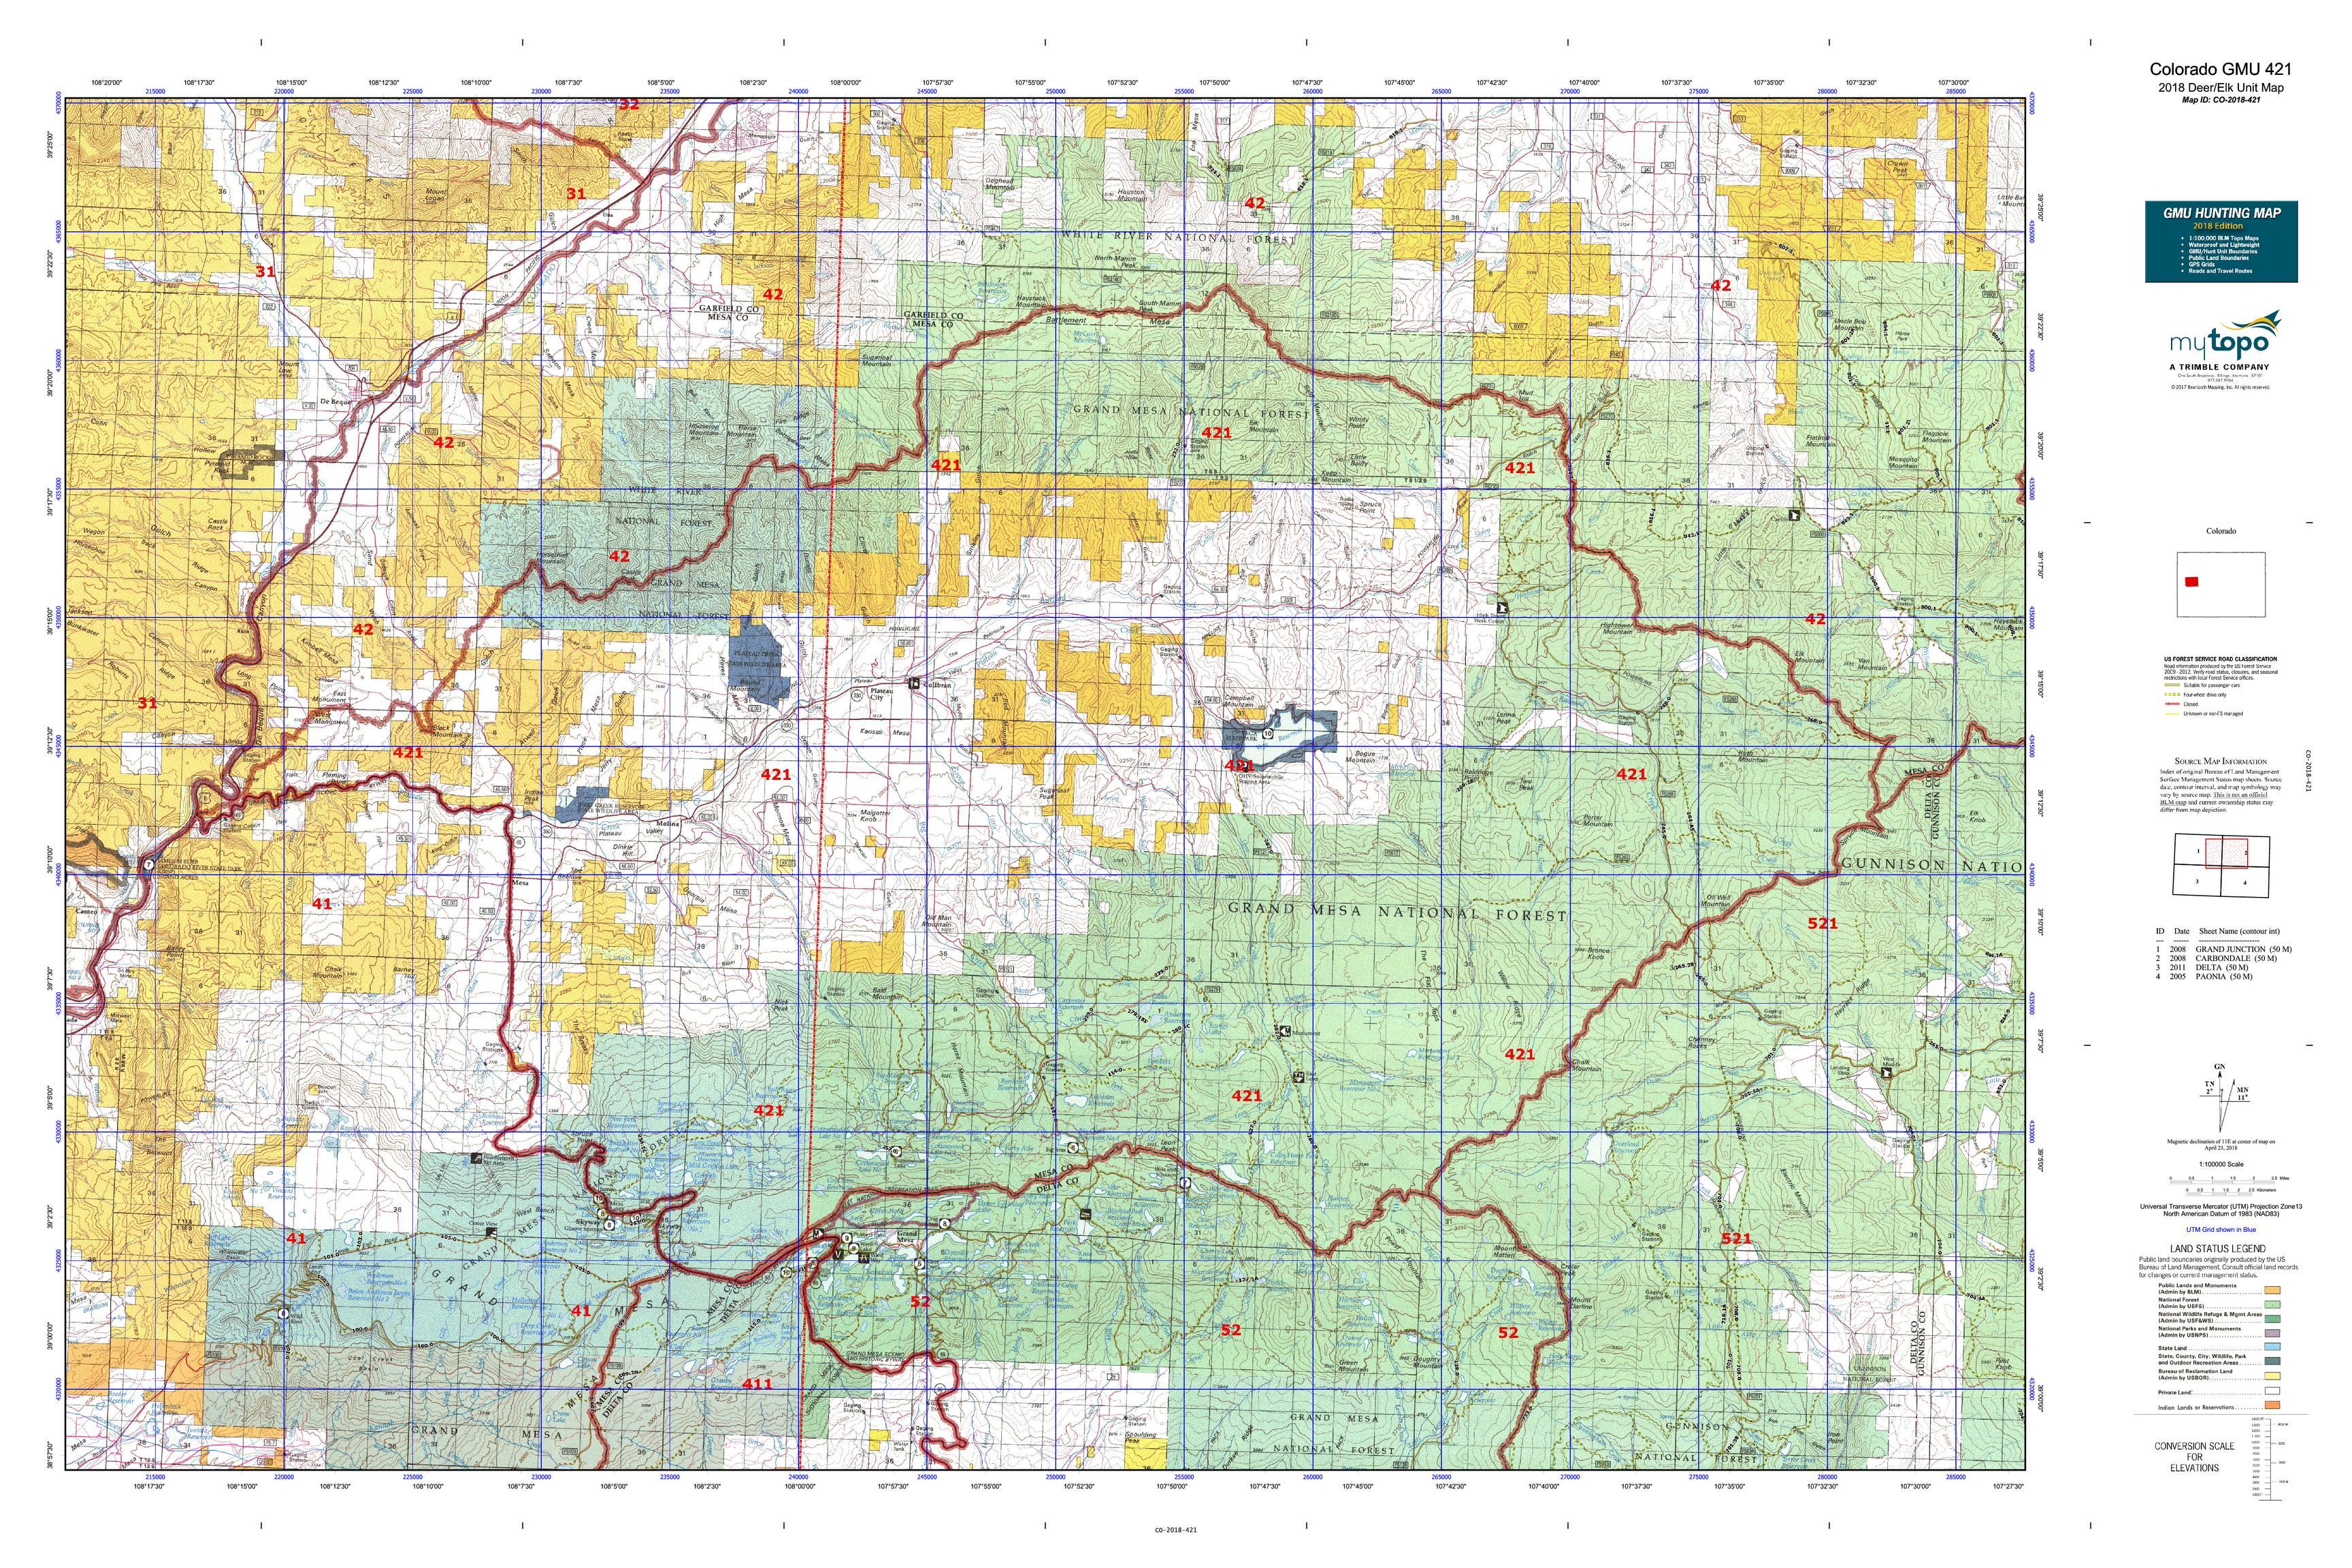 Colorado GMU 421 Map | MyTopo